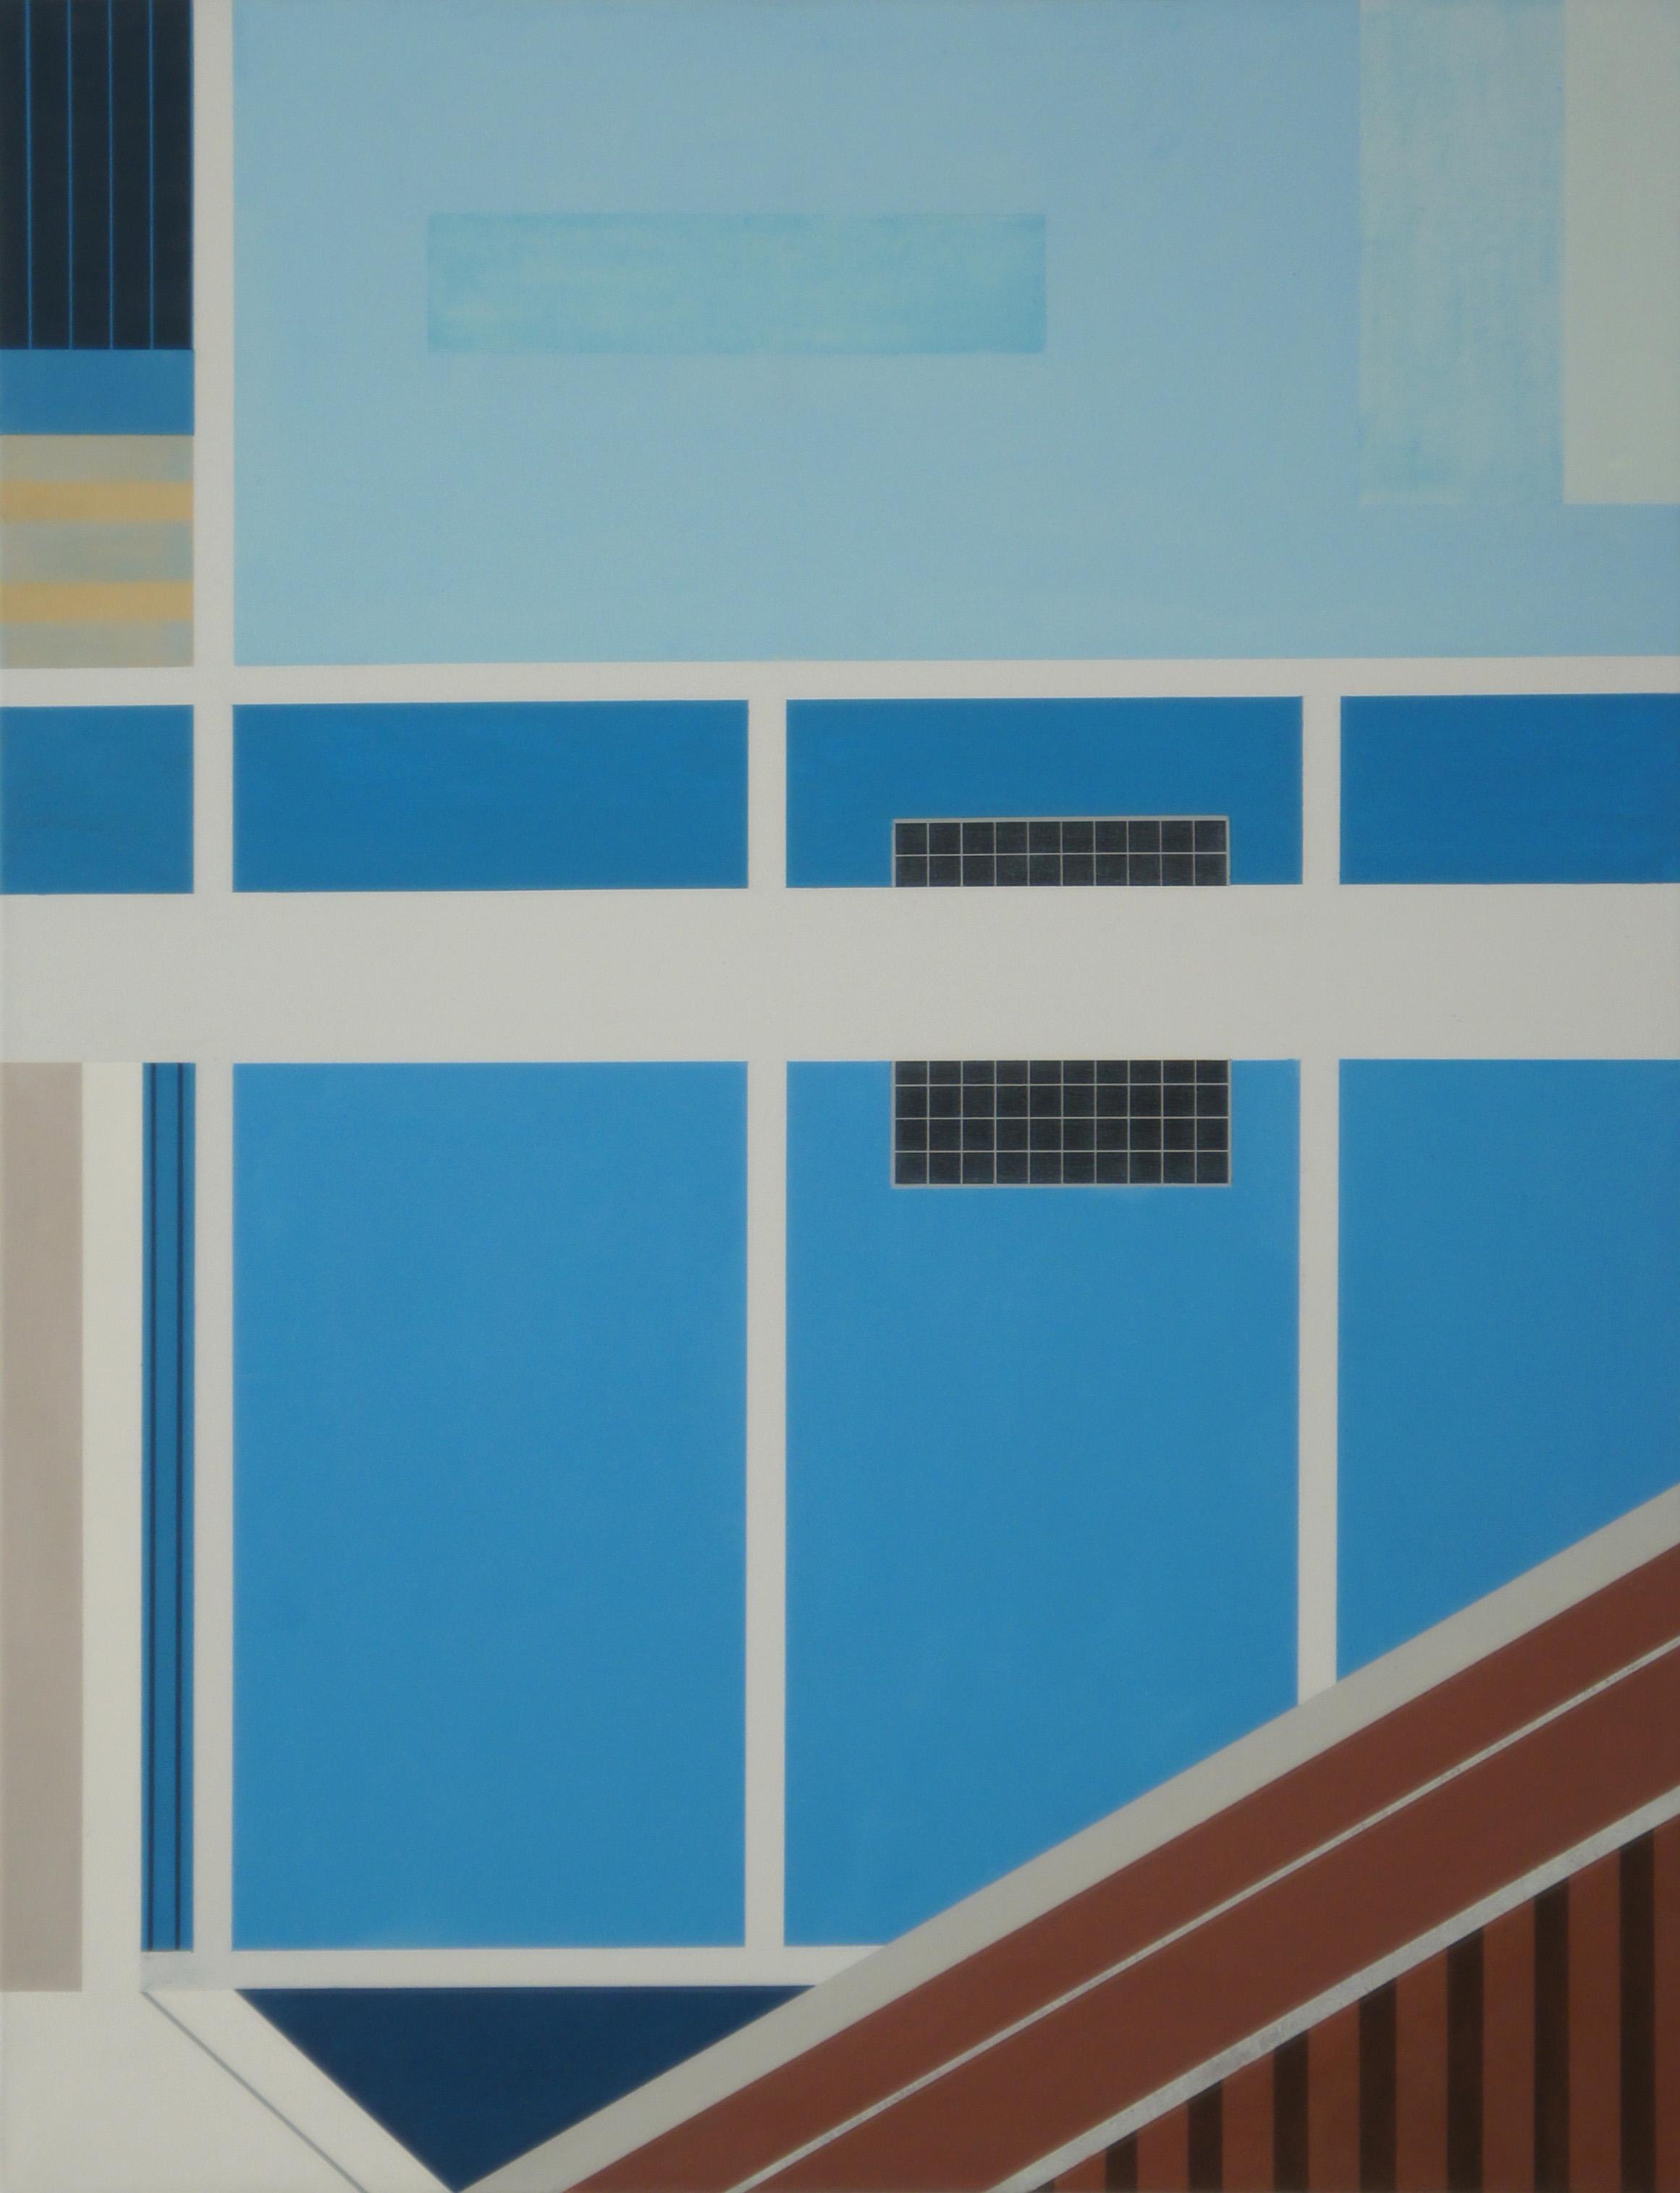 In Ratchaburi IV, 2011, 105 x 80 cm, Ölfarbe auf Leinwand In Ratchaburi IV, 2011, 105 x 80 cm, Oil on canvas